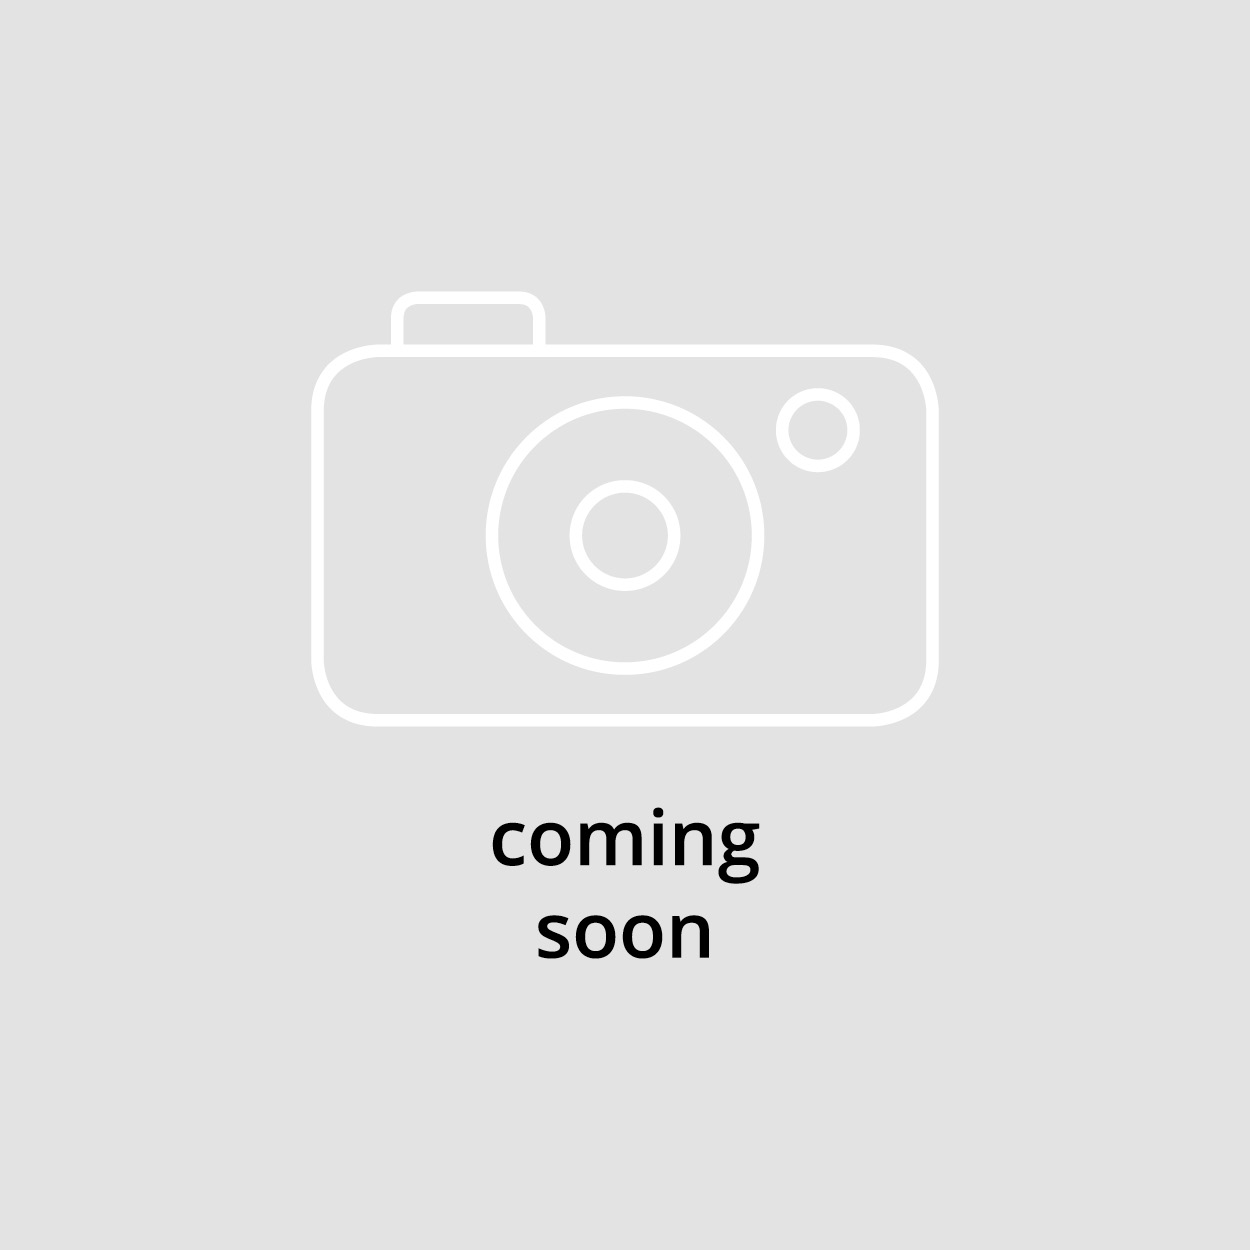 45.52.141 Boccola in bronzo slitta doppia da ripresa idraulico Gildemeister AS20, GS20, GM20, GM20AC